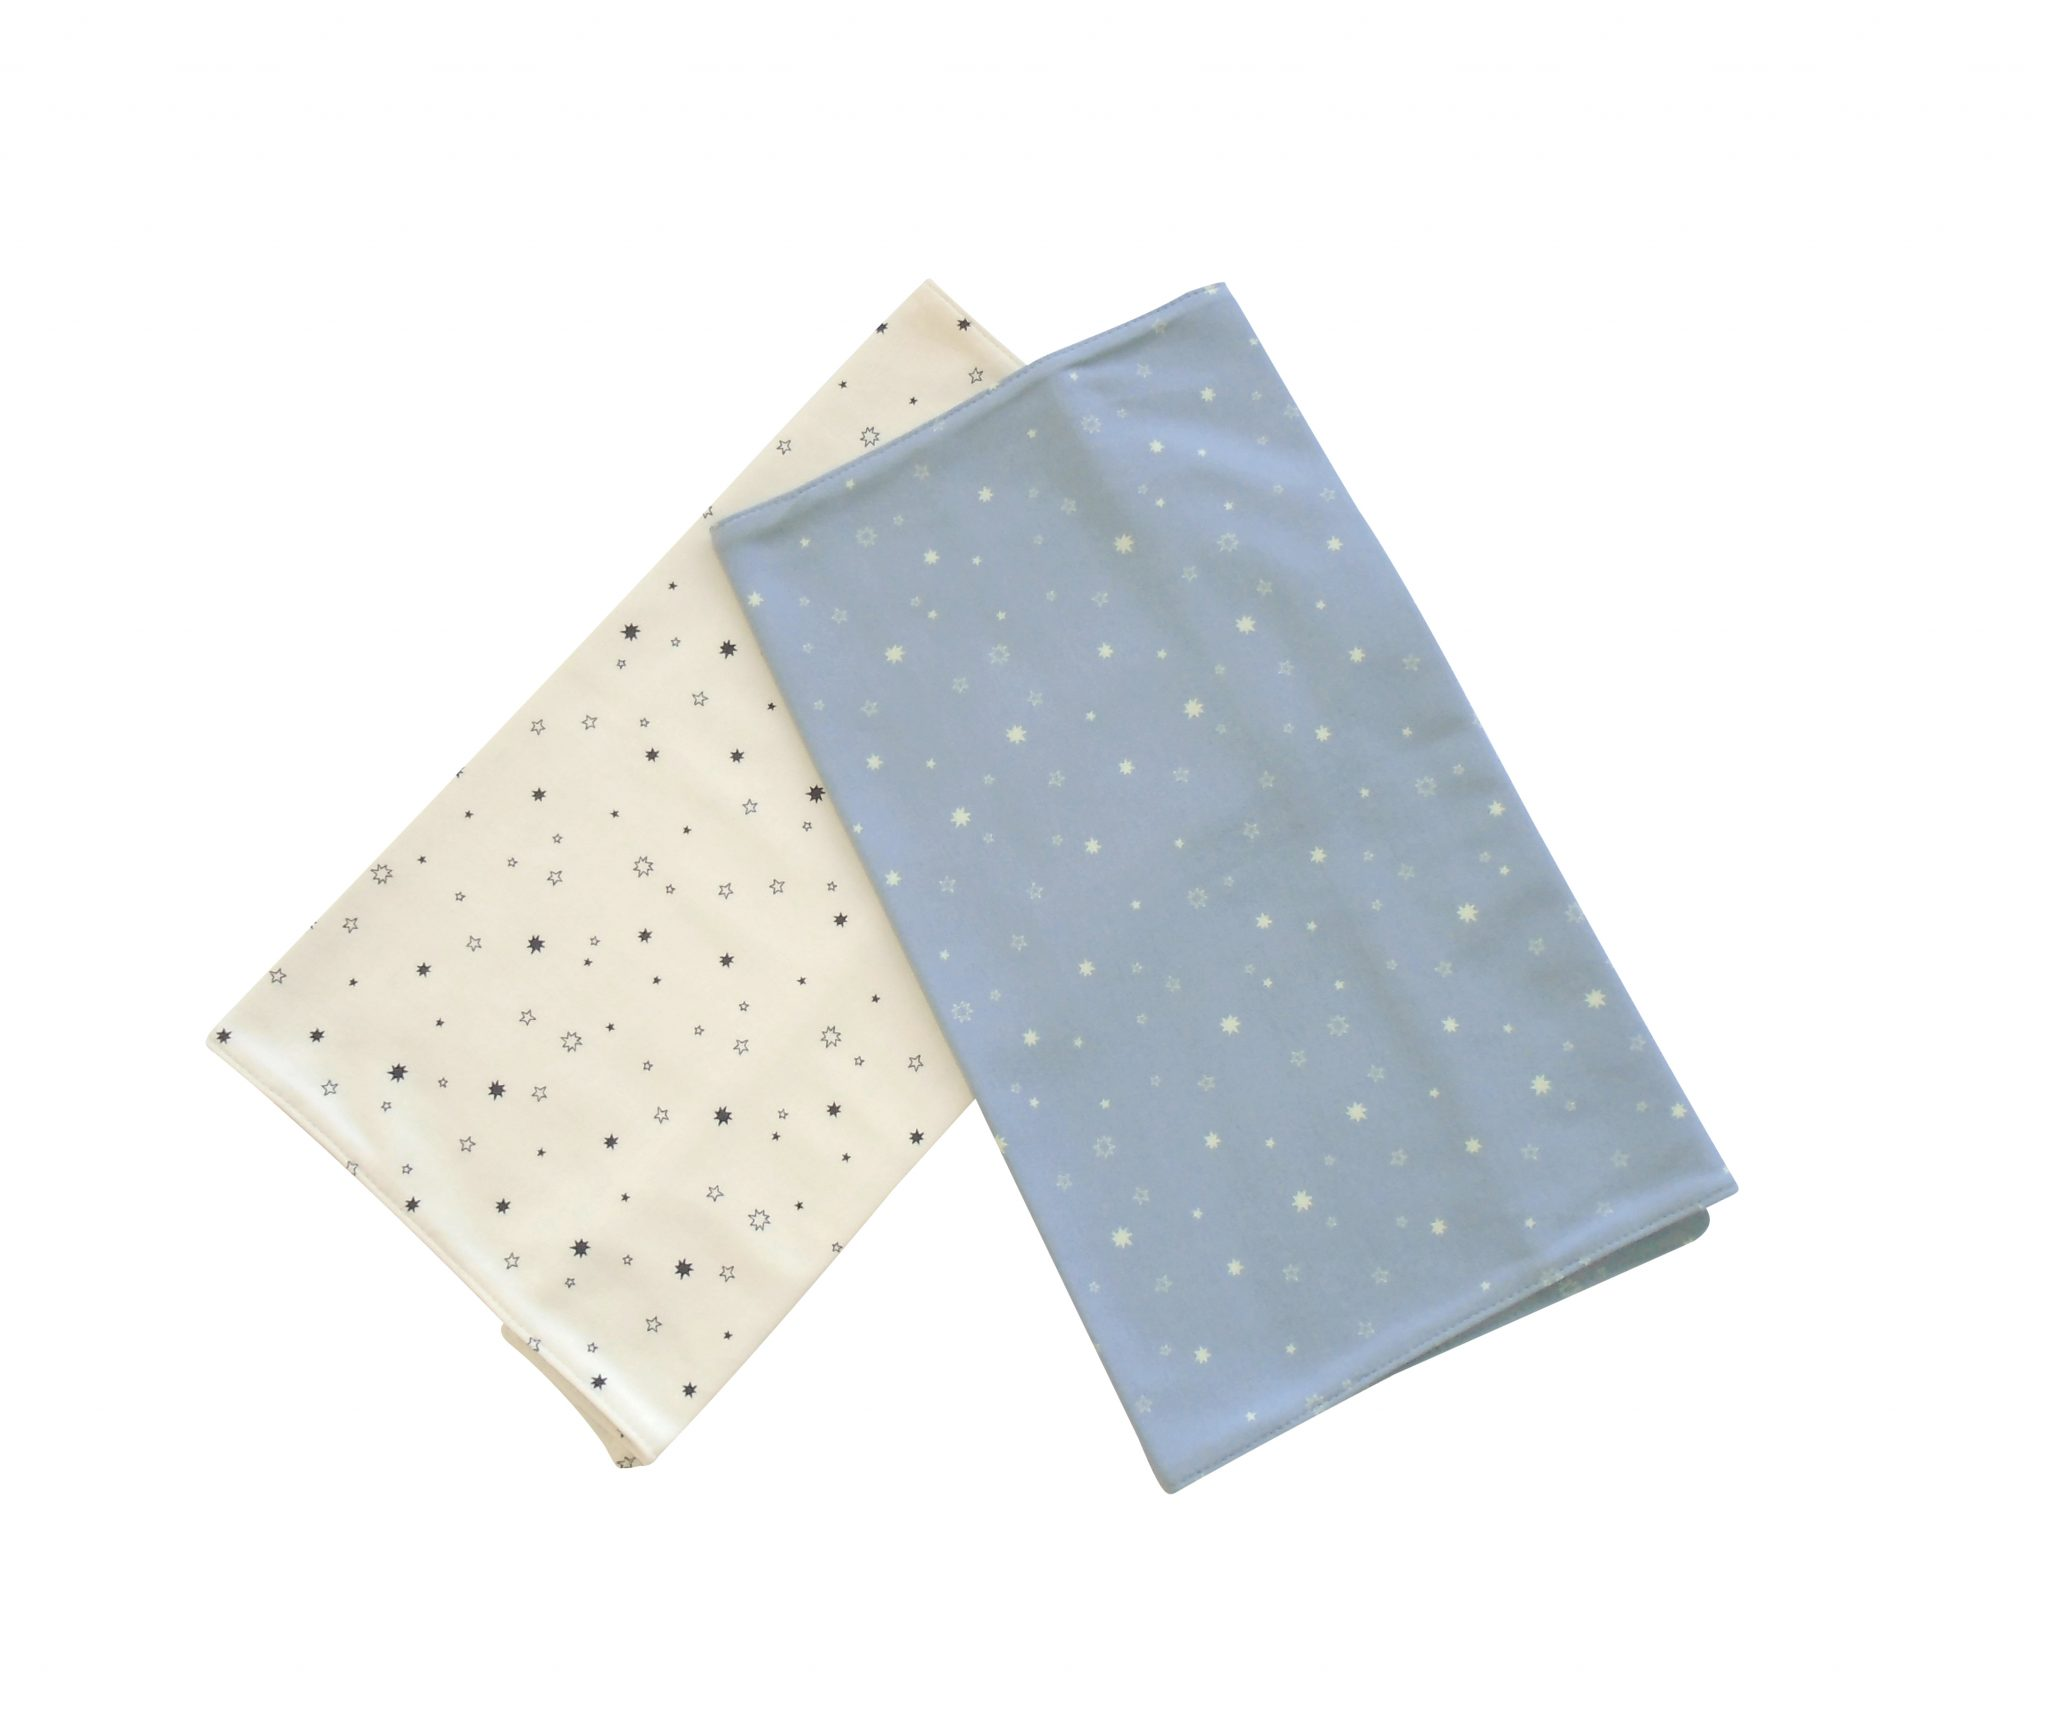 Pack 2 Mantas Stars Pima Organico • Moonwear fe2b2204e3dd